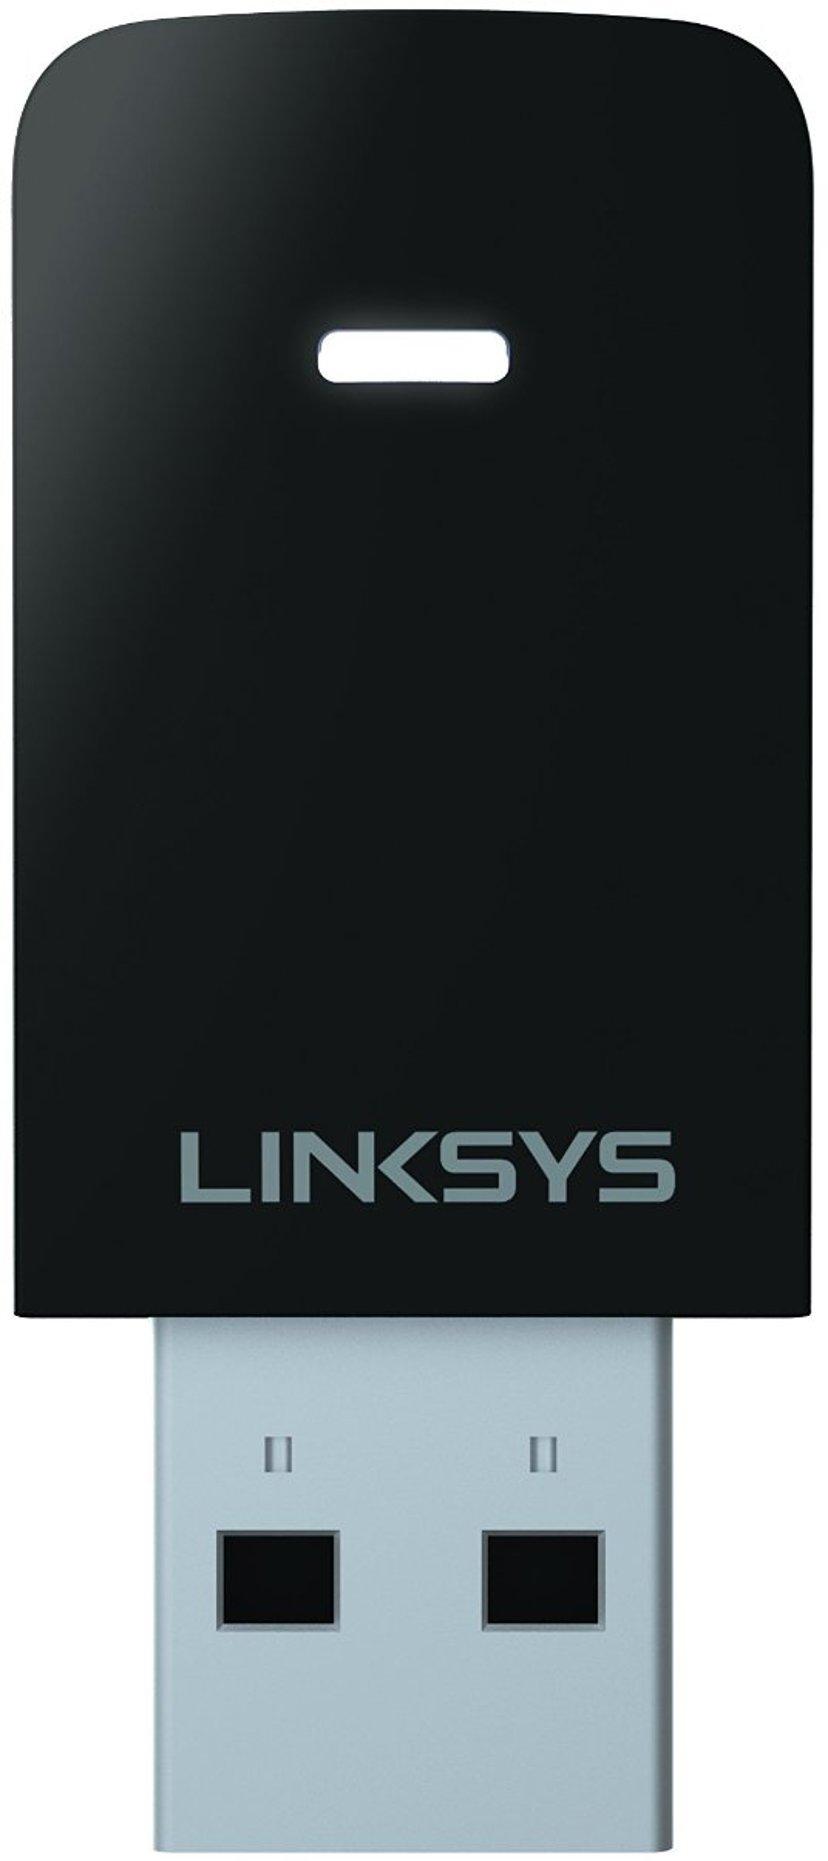 Linksys WUSB6400M AC1200 USB Adapter